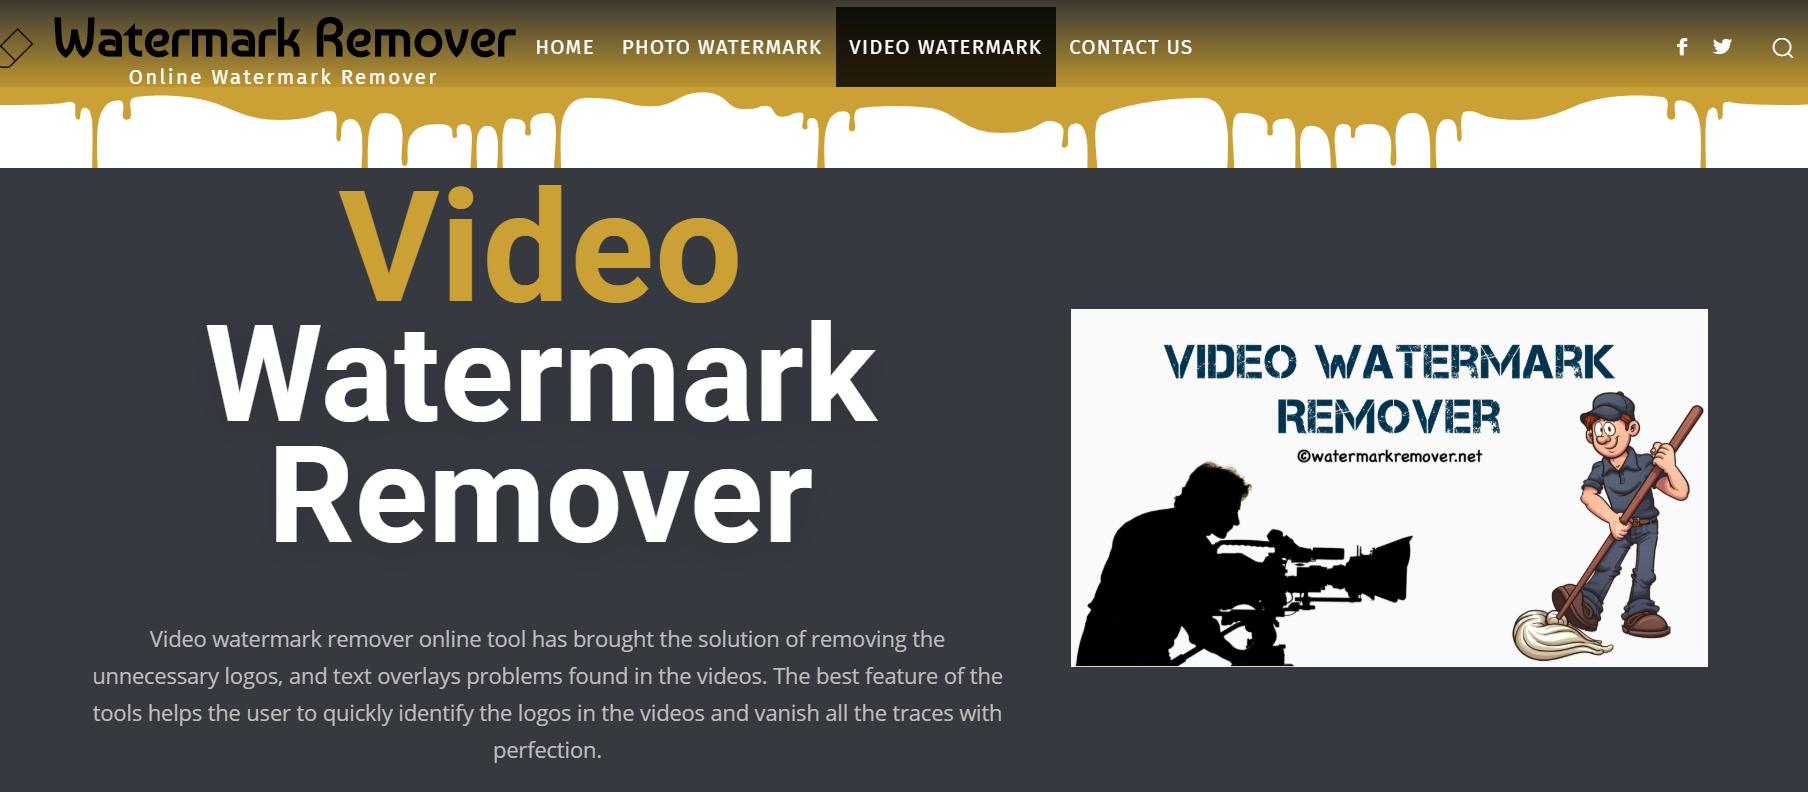 watetermark-remover-online